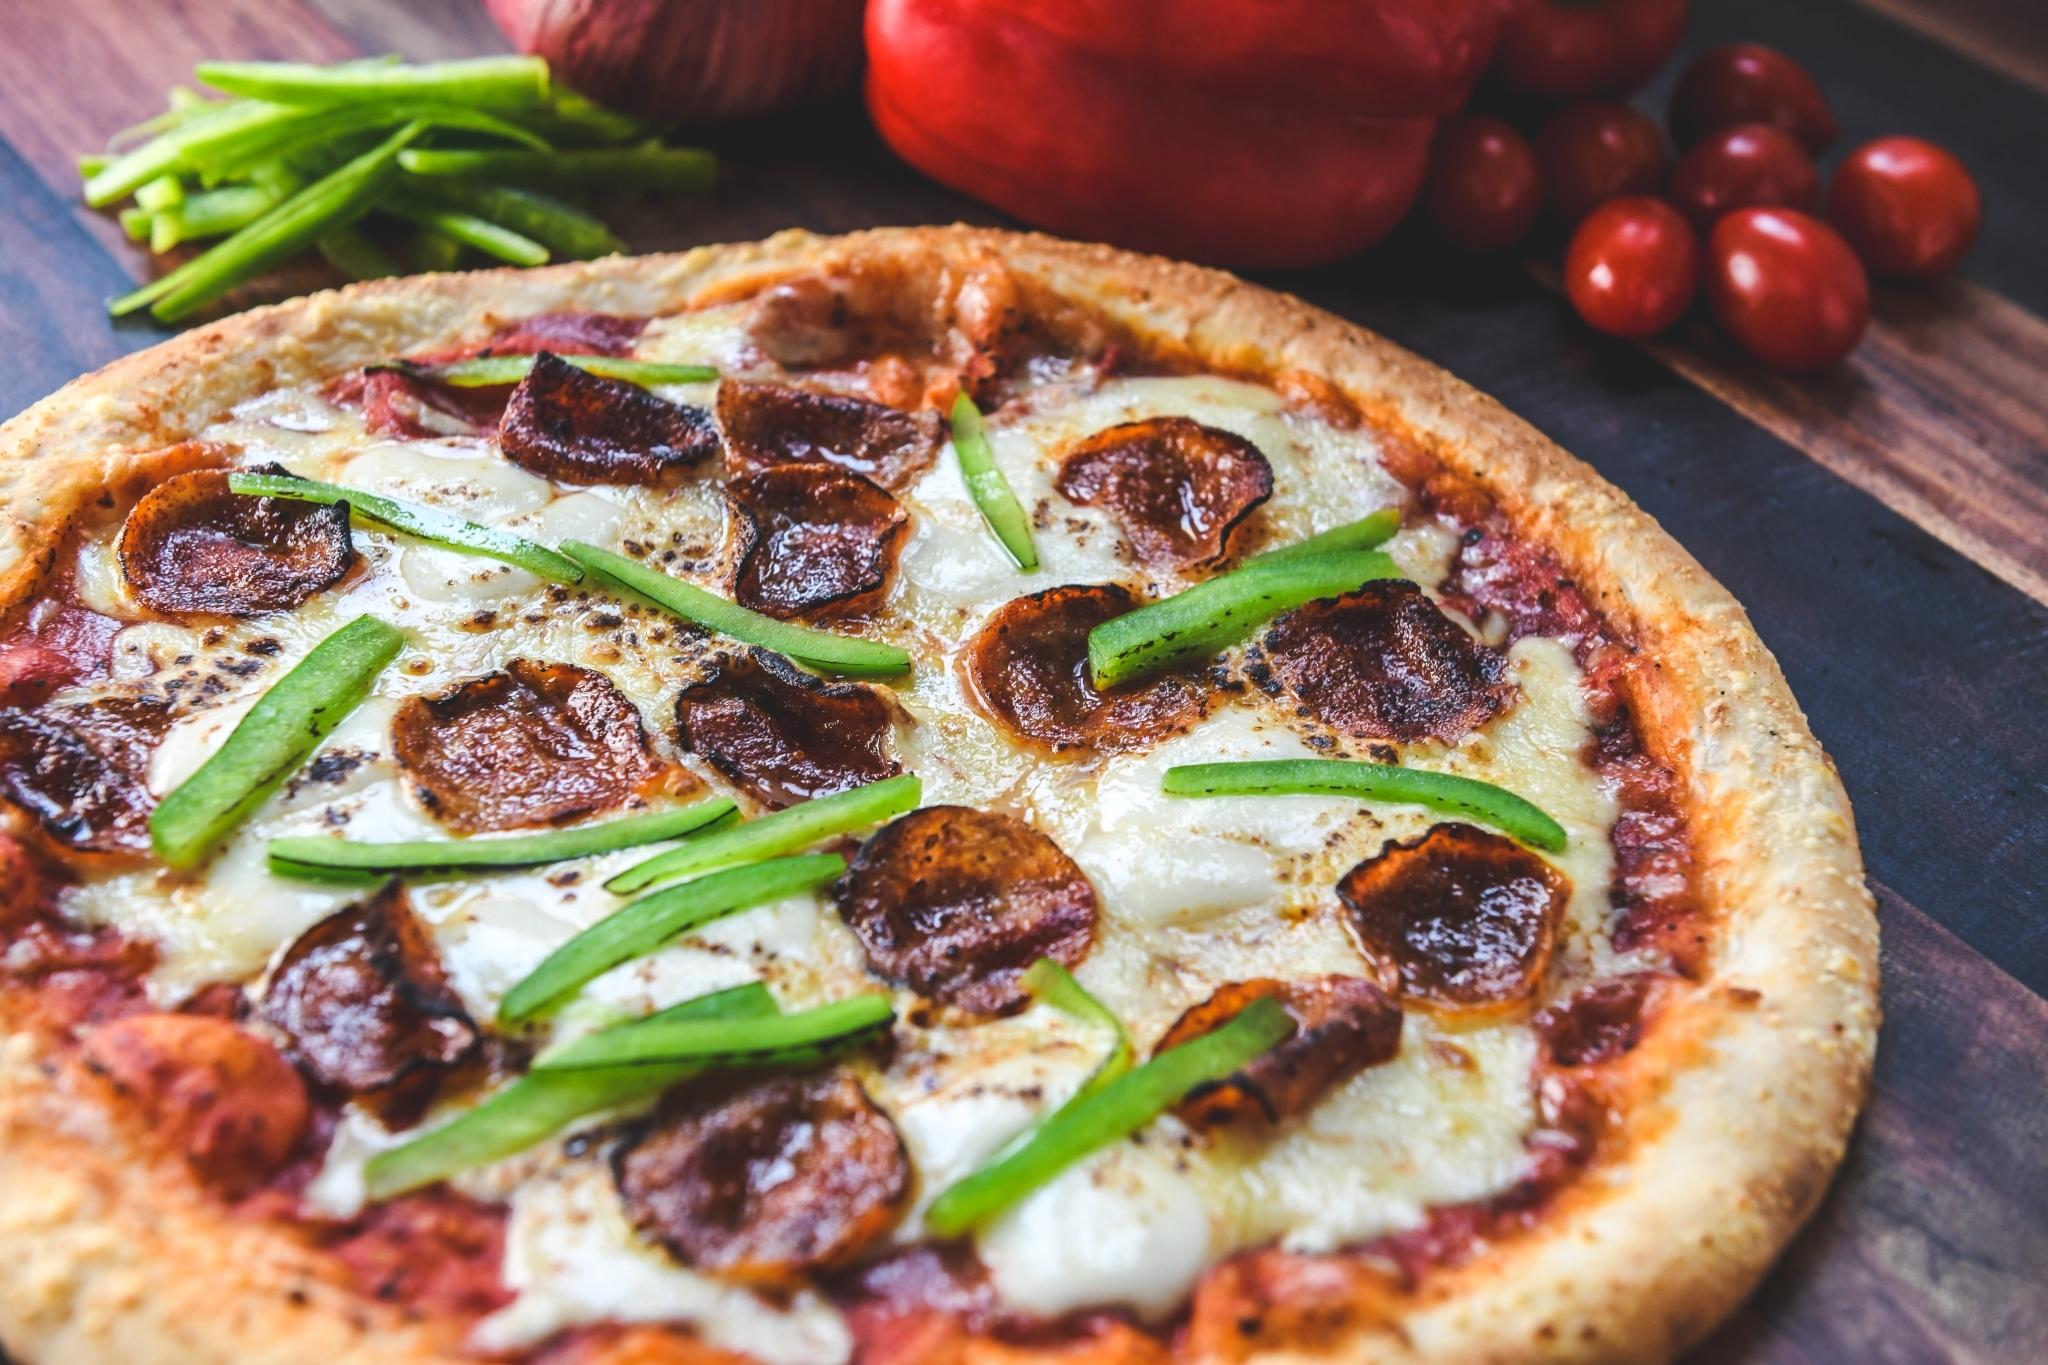 Southside Pizza Co. pizza